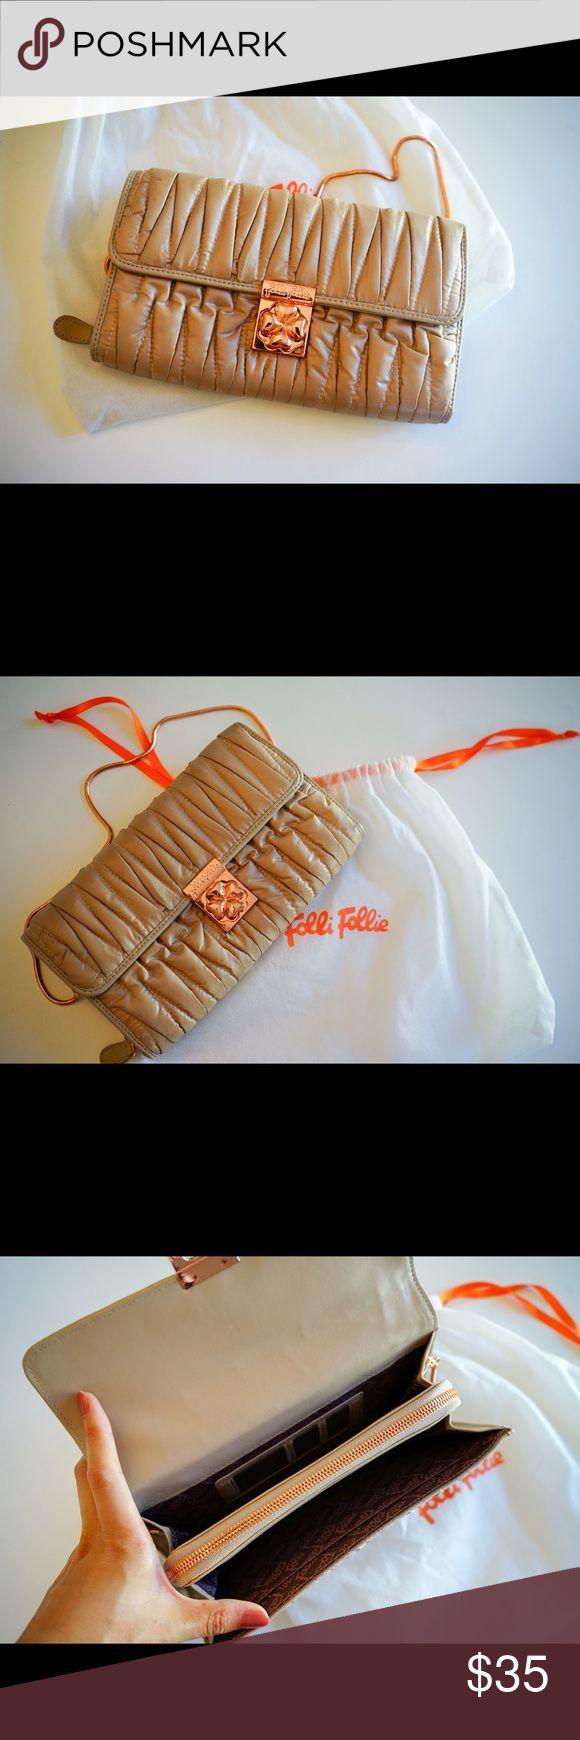 NWOT Folli Follie handbag/WOC Received as a gift. Never used. Dust bag included. Folli Follie Bags Wallets